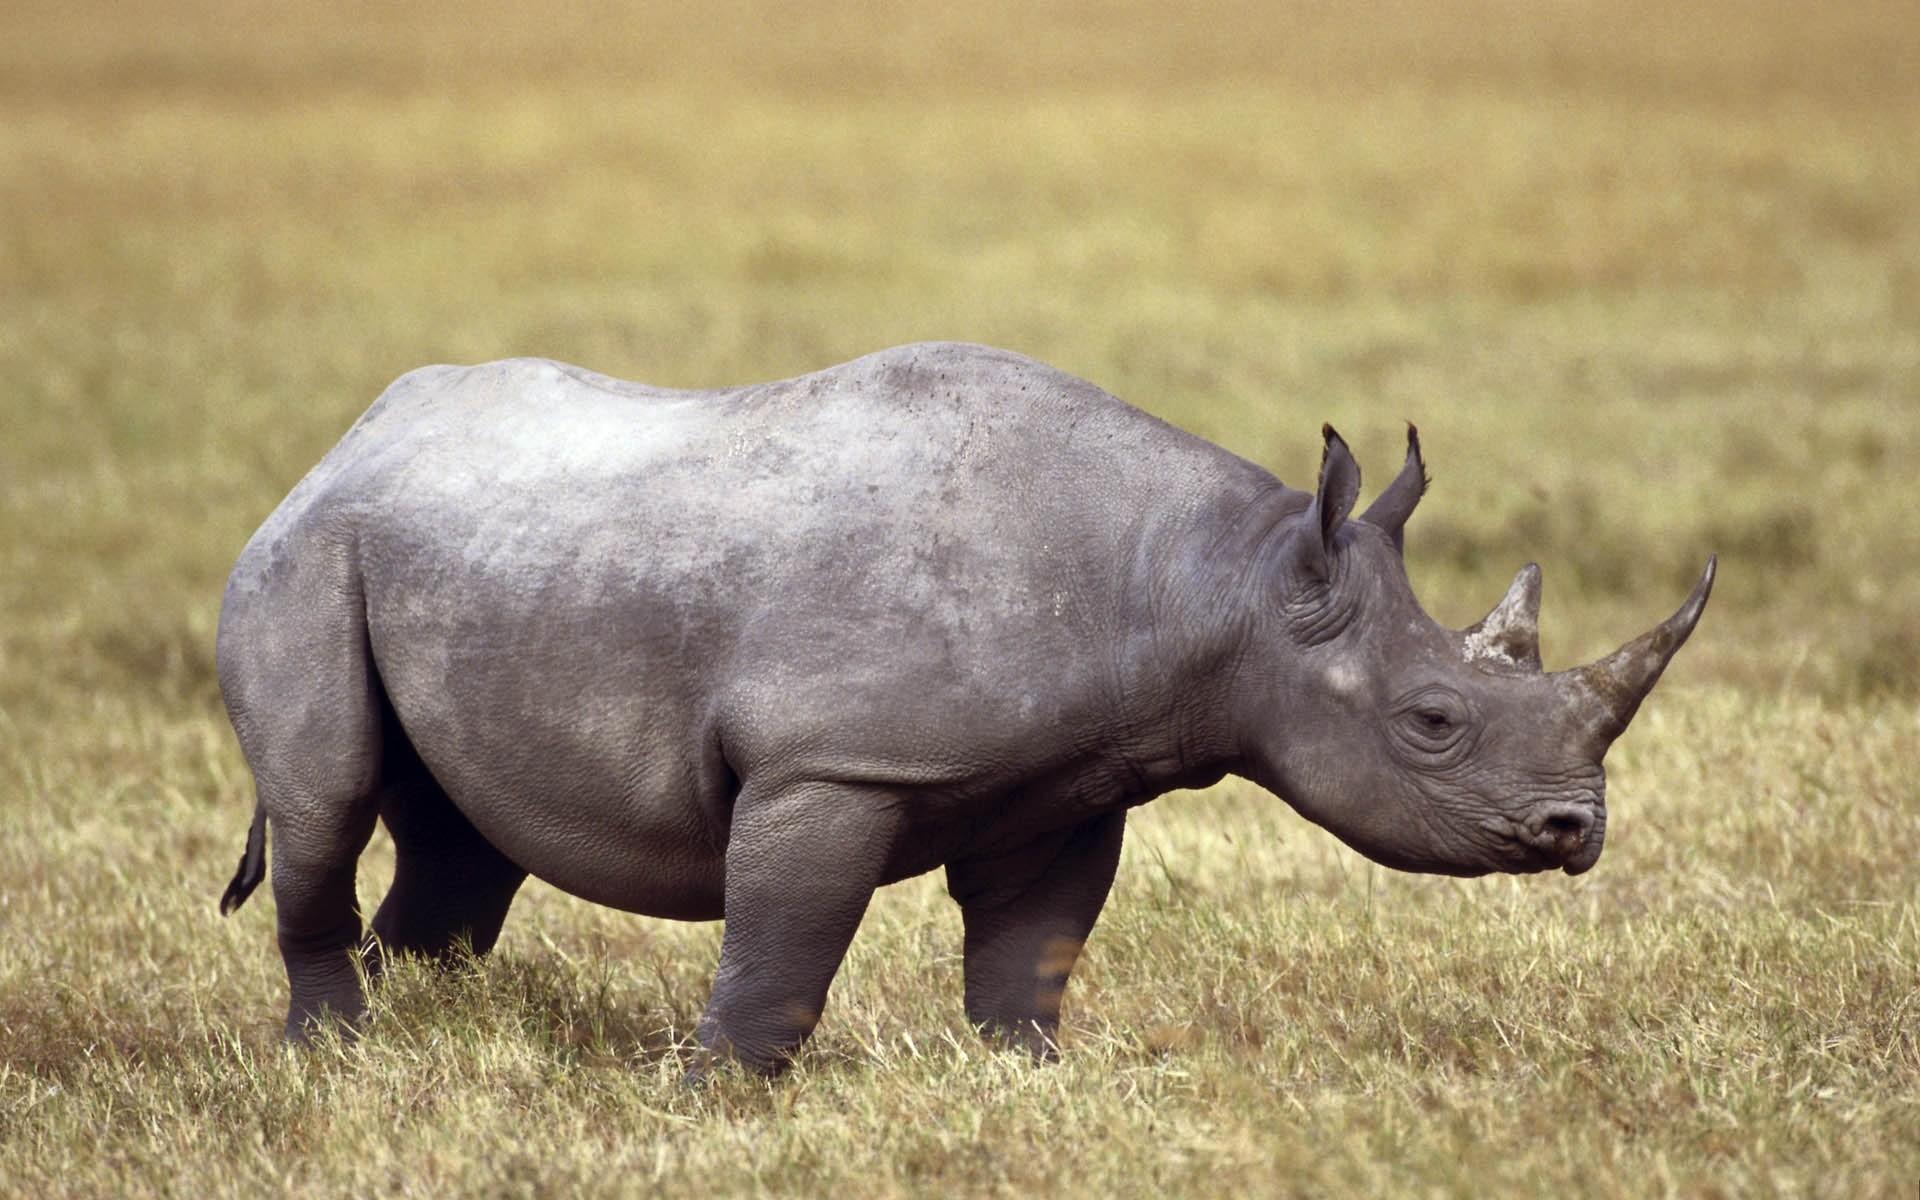 General 1920x1200 animals rhino wildlife mammals outdoors